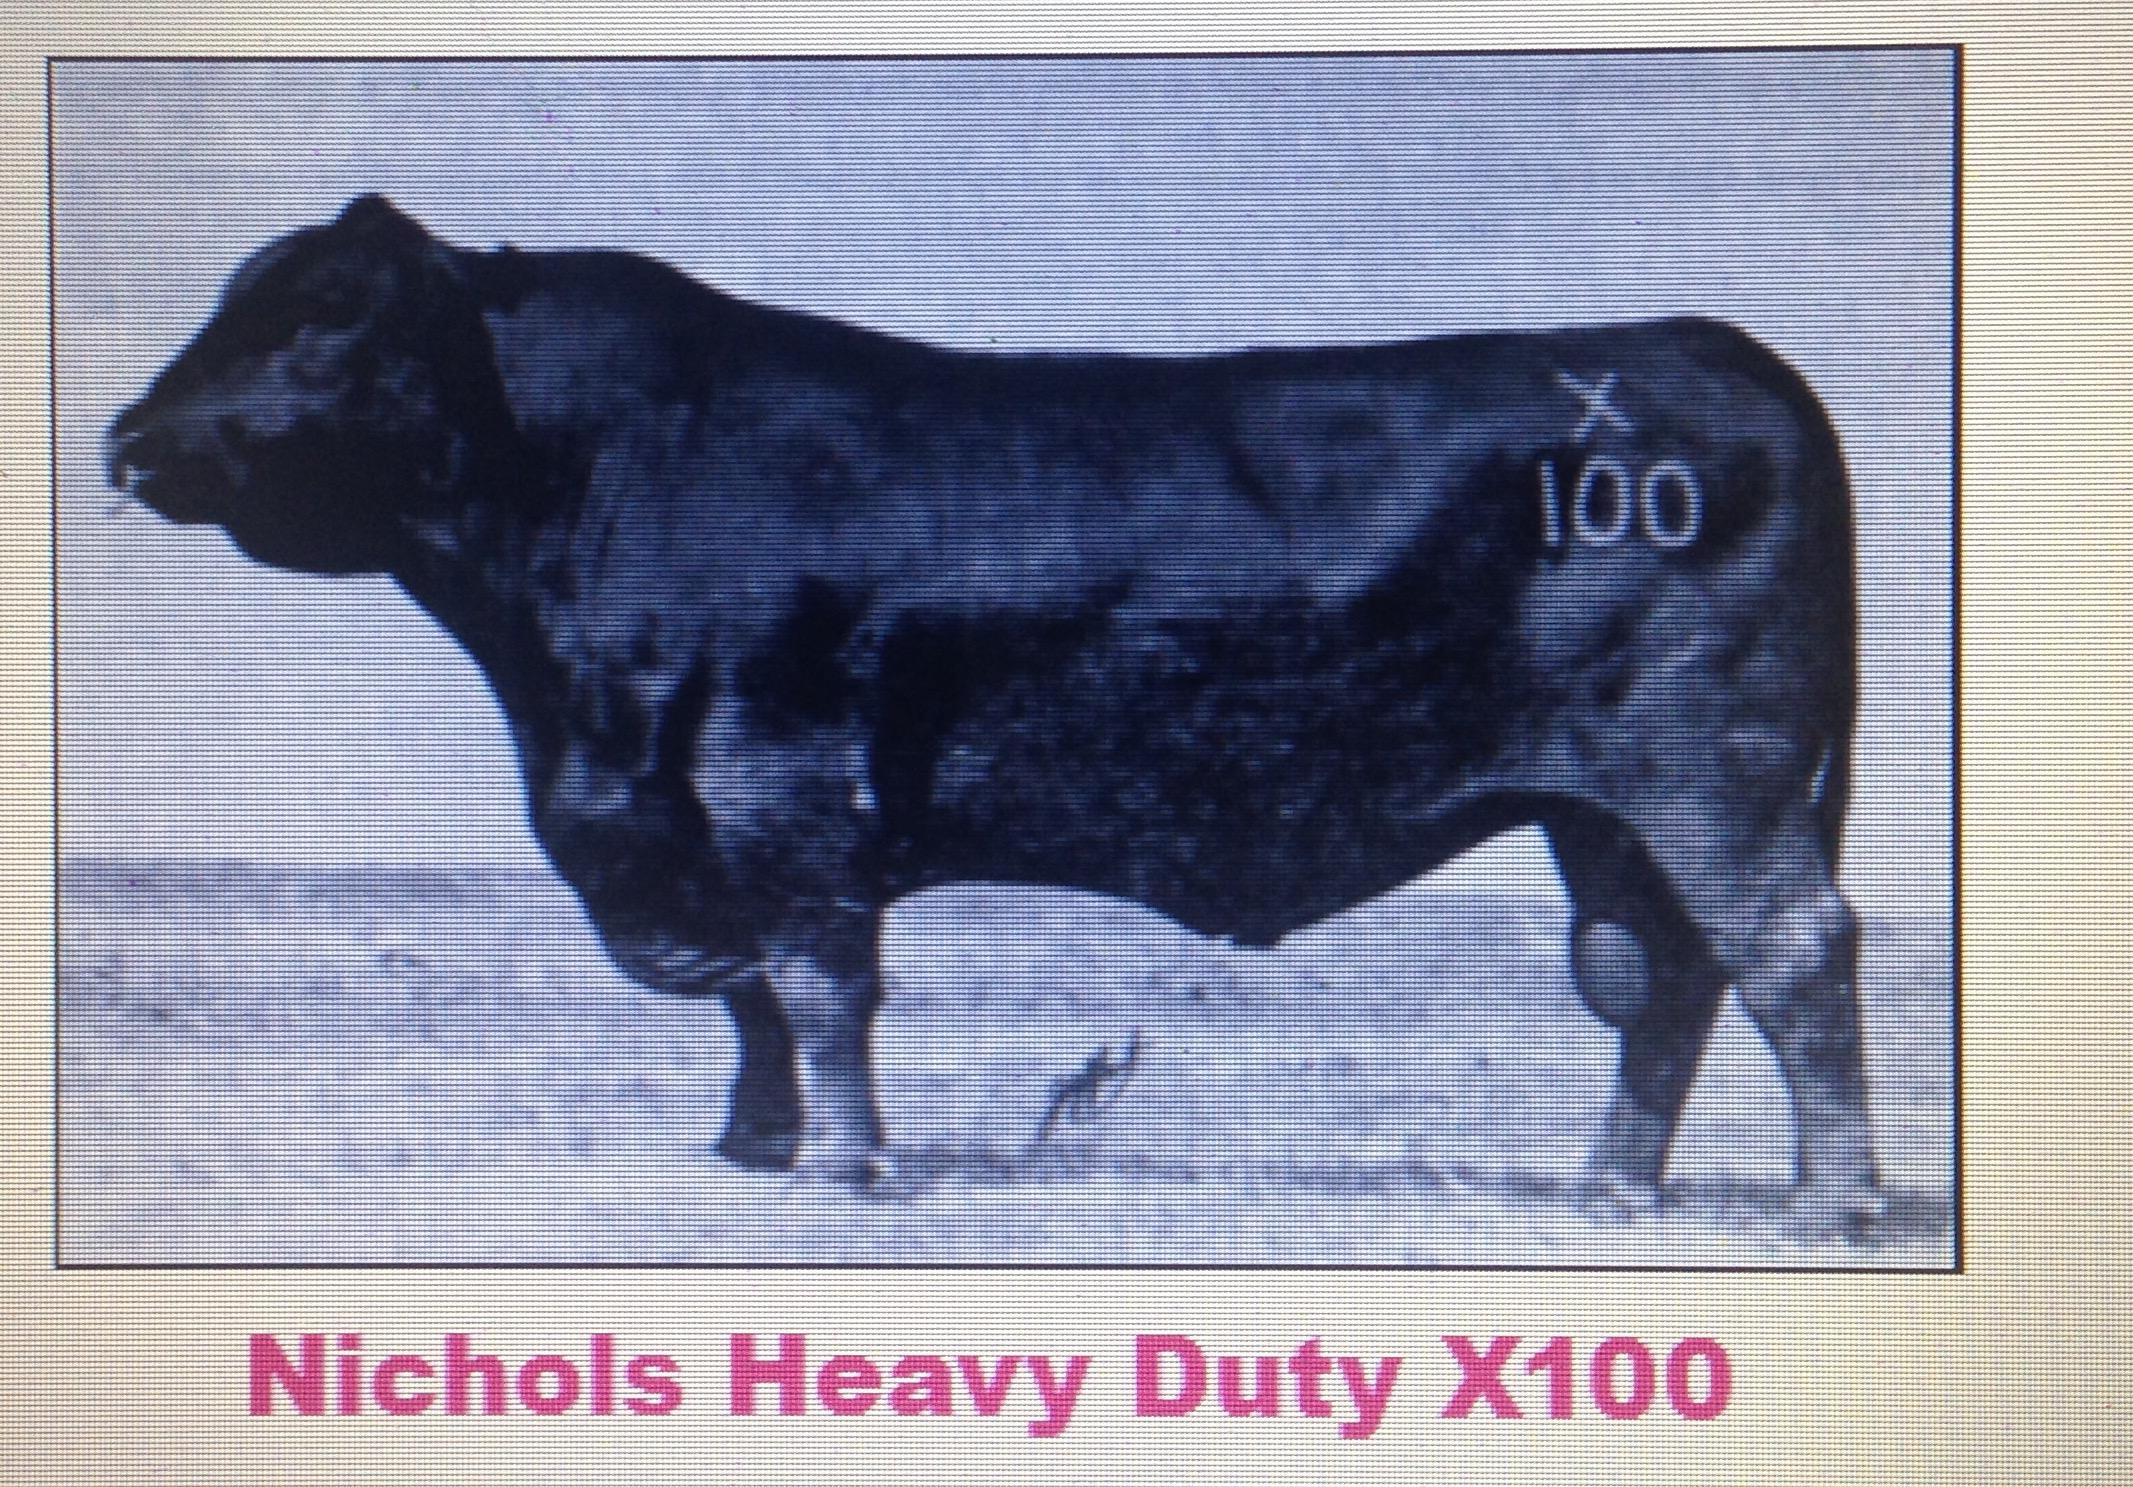 8 straws of Nichols Heavy Duty